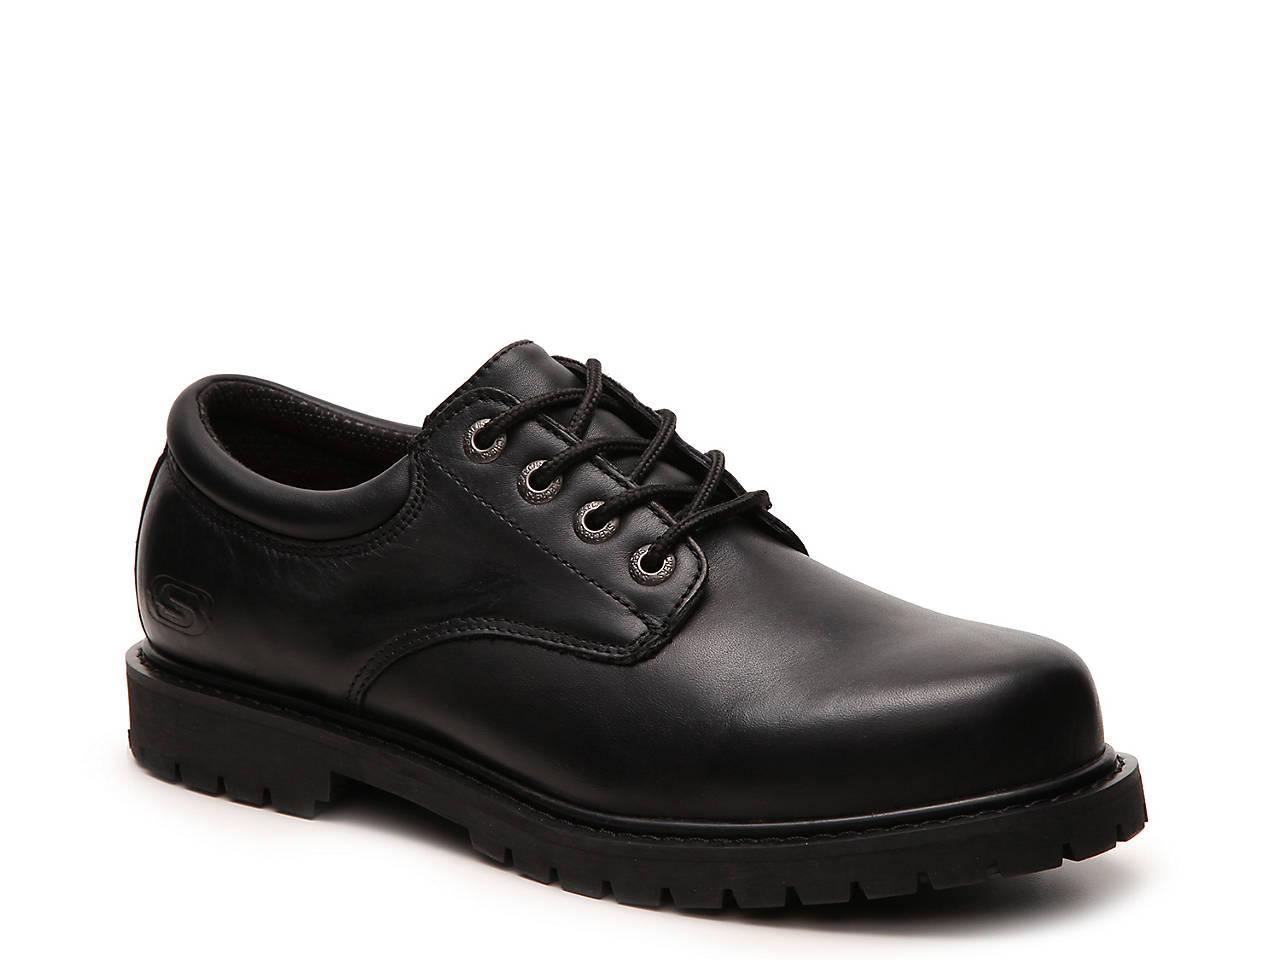 skechers relaxed fit memory foam work shoes